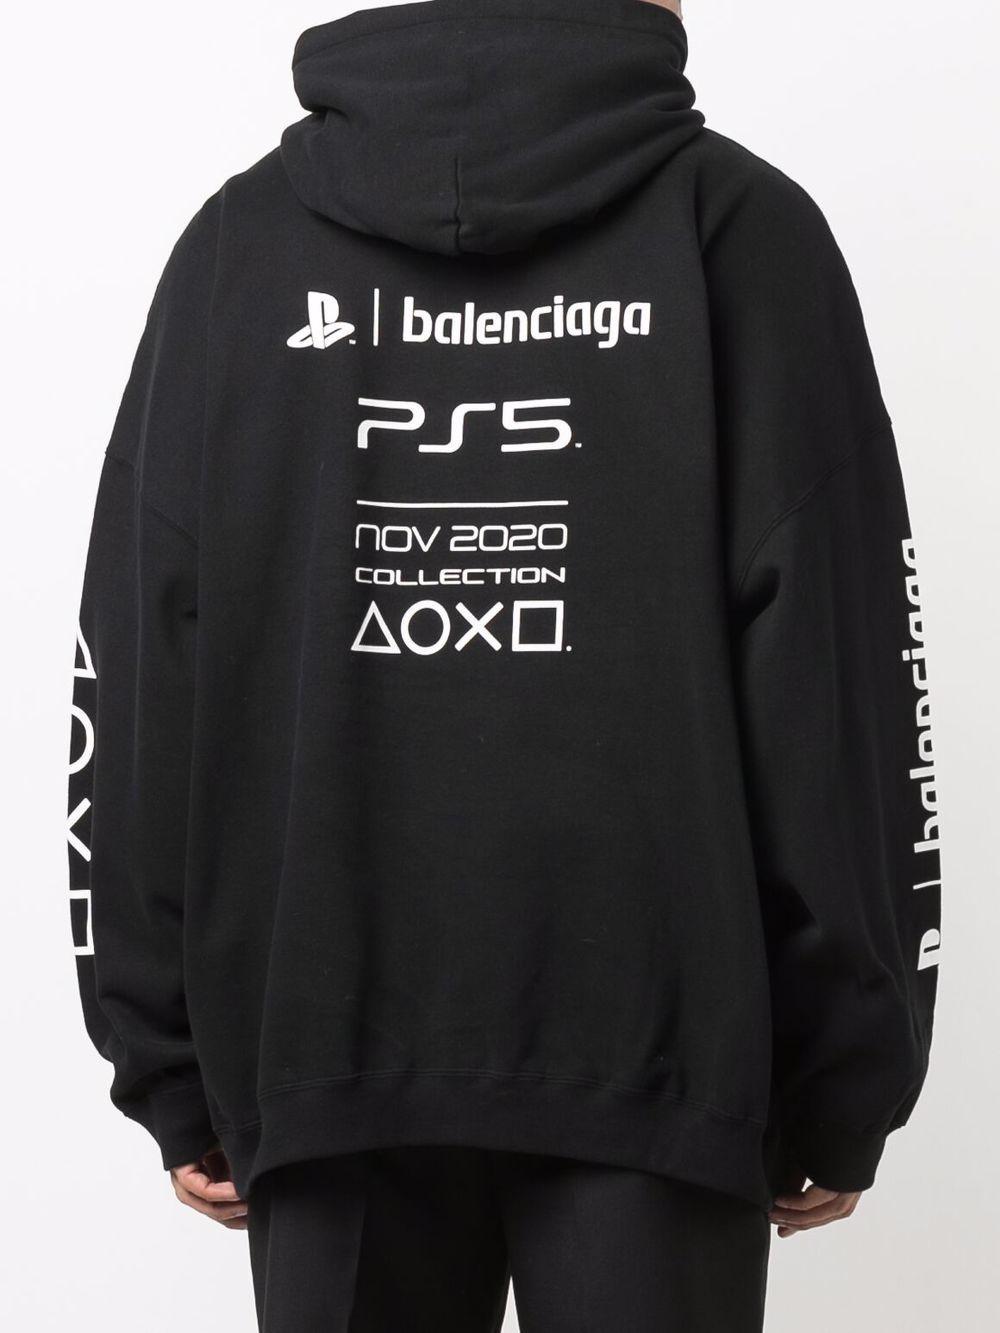 Picture of Balenciaga | Ps5 Sweatshirt